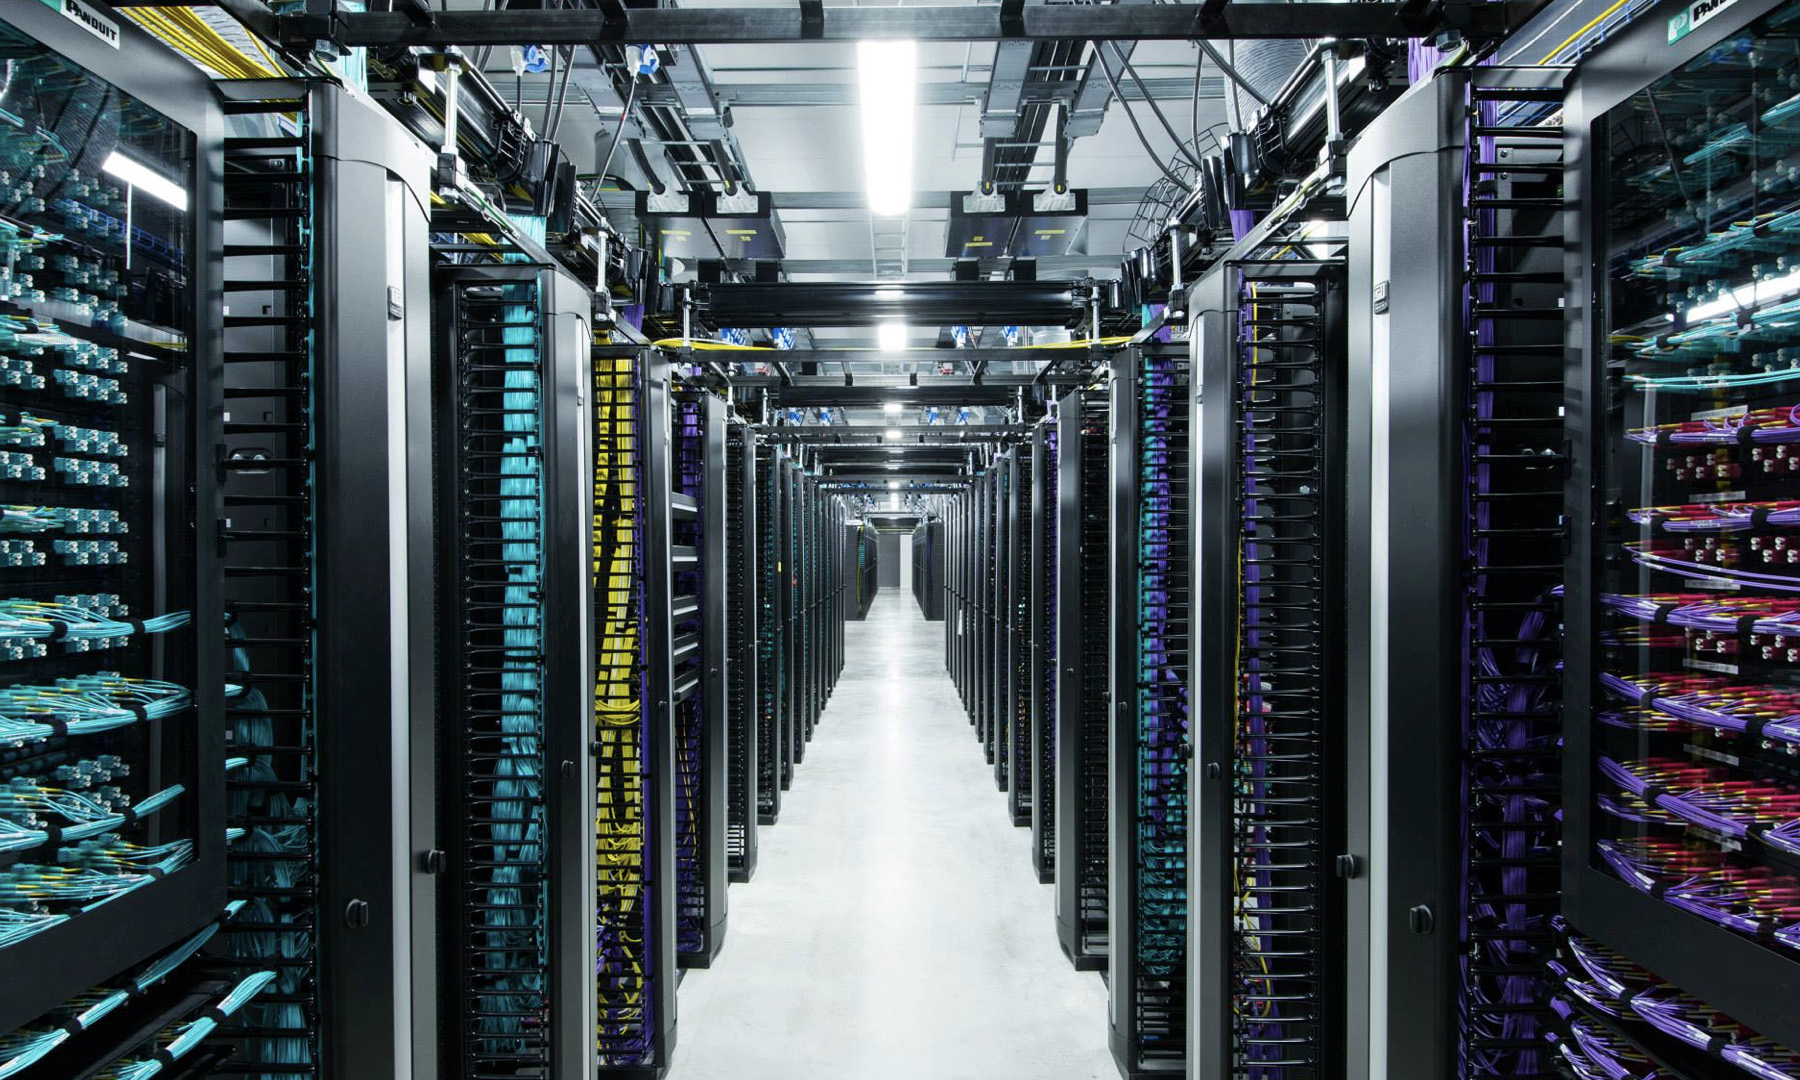 hight resolution of introducing data center fabric the next generation facebook data center network facebook code